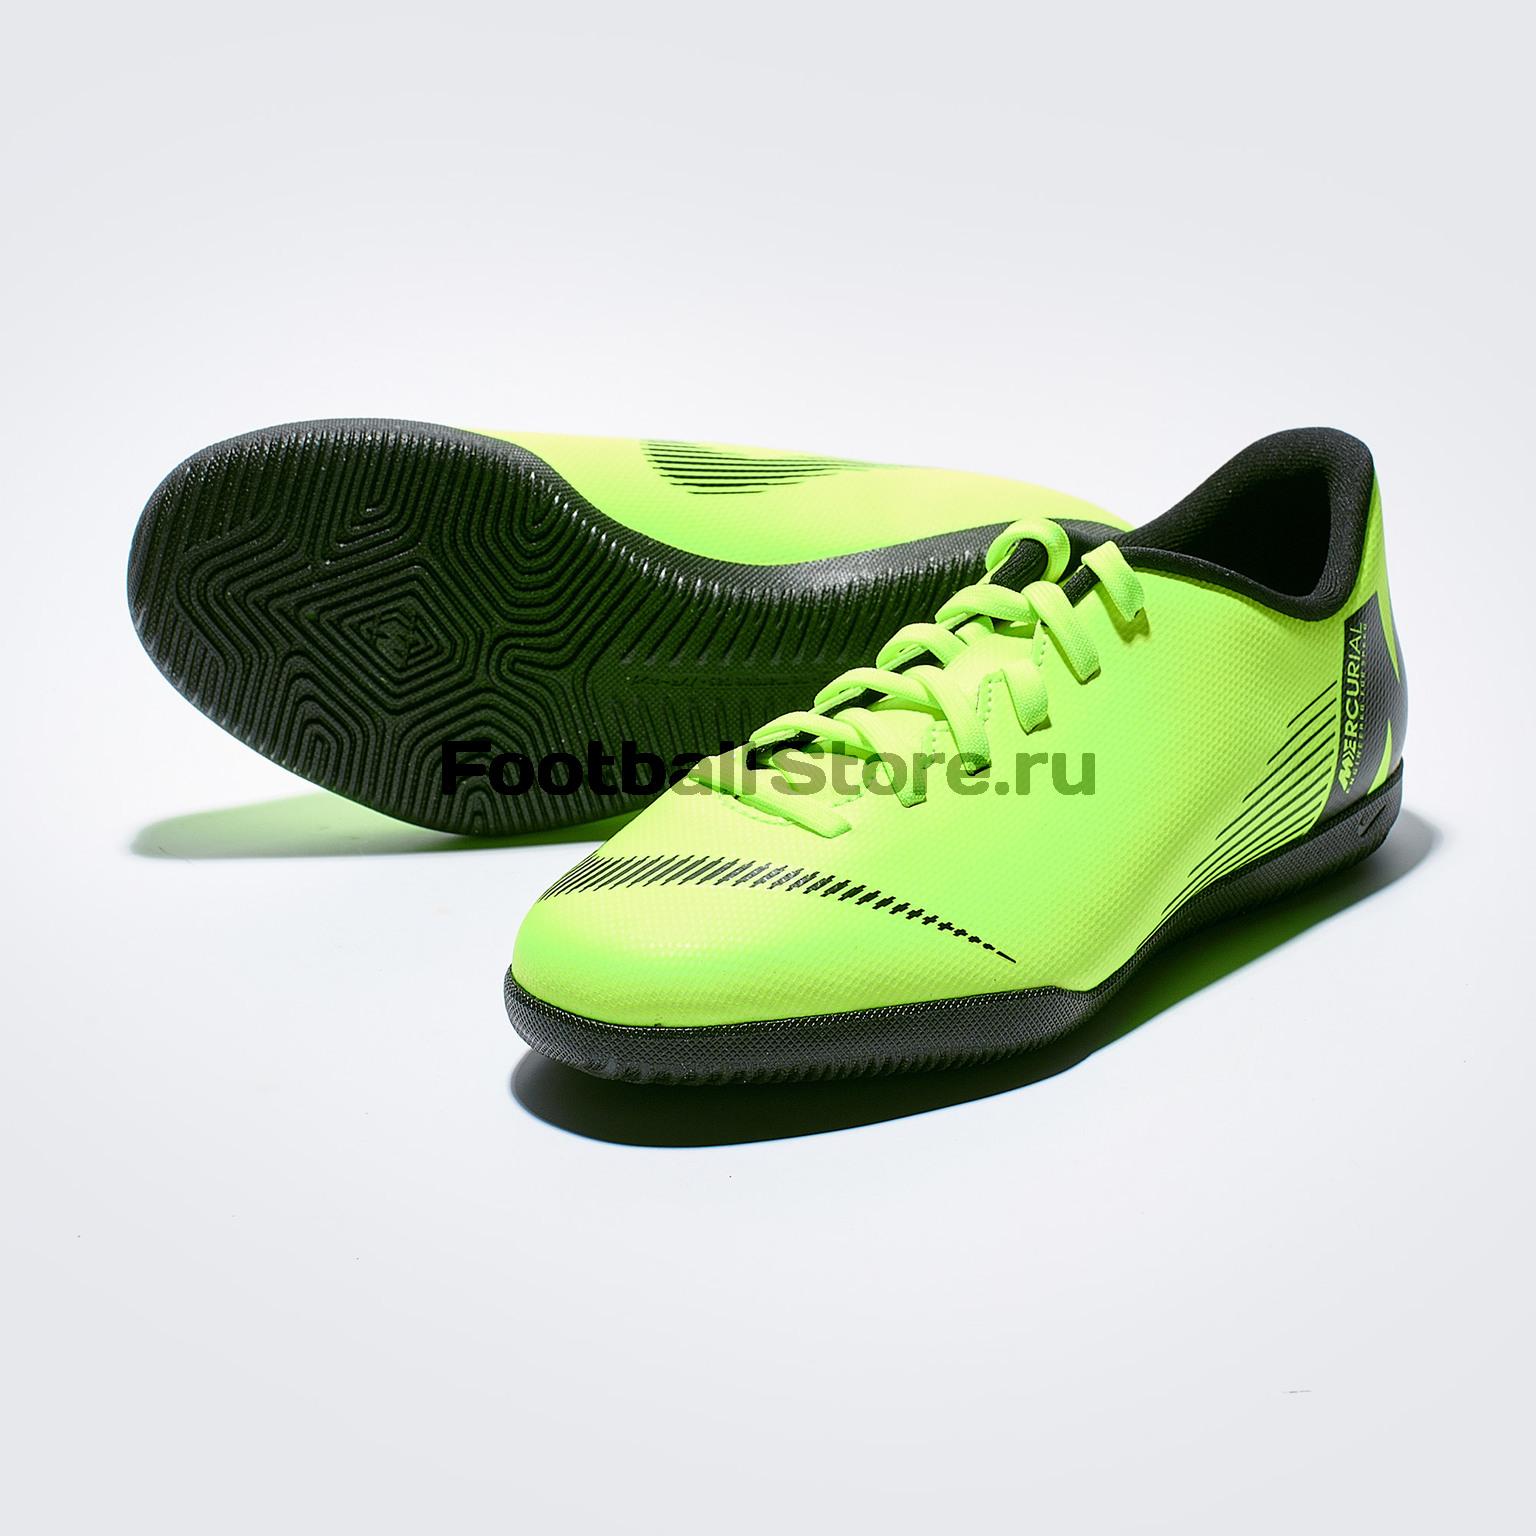 Футзалки детские Nike VaporX 12 Club GS IC AH7354-701 nike бутсы мужские nike neymar vaporx 12 club ic размер 41 5